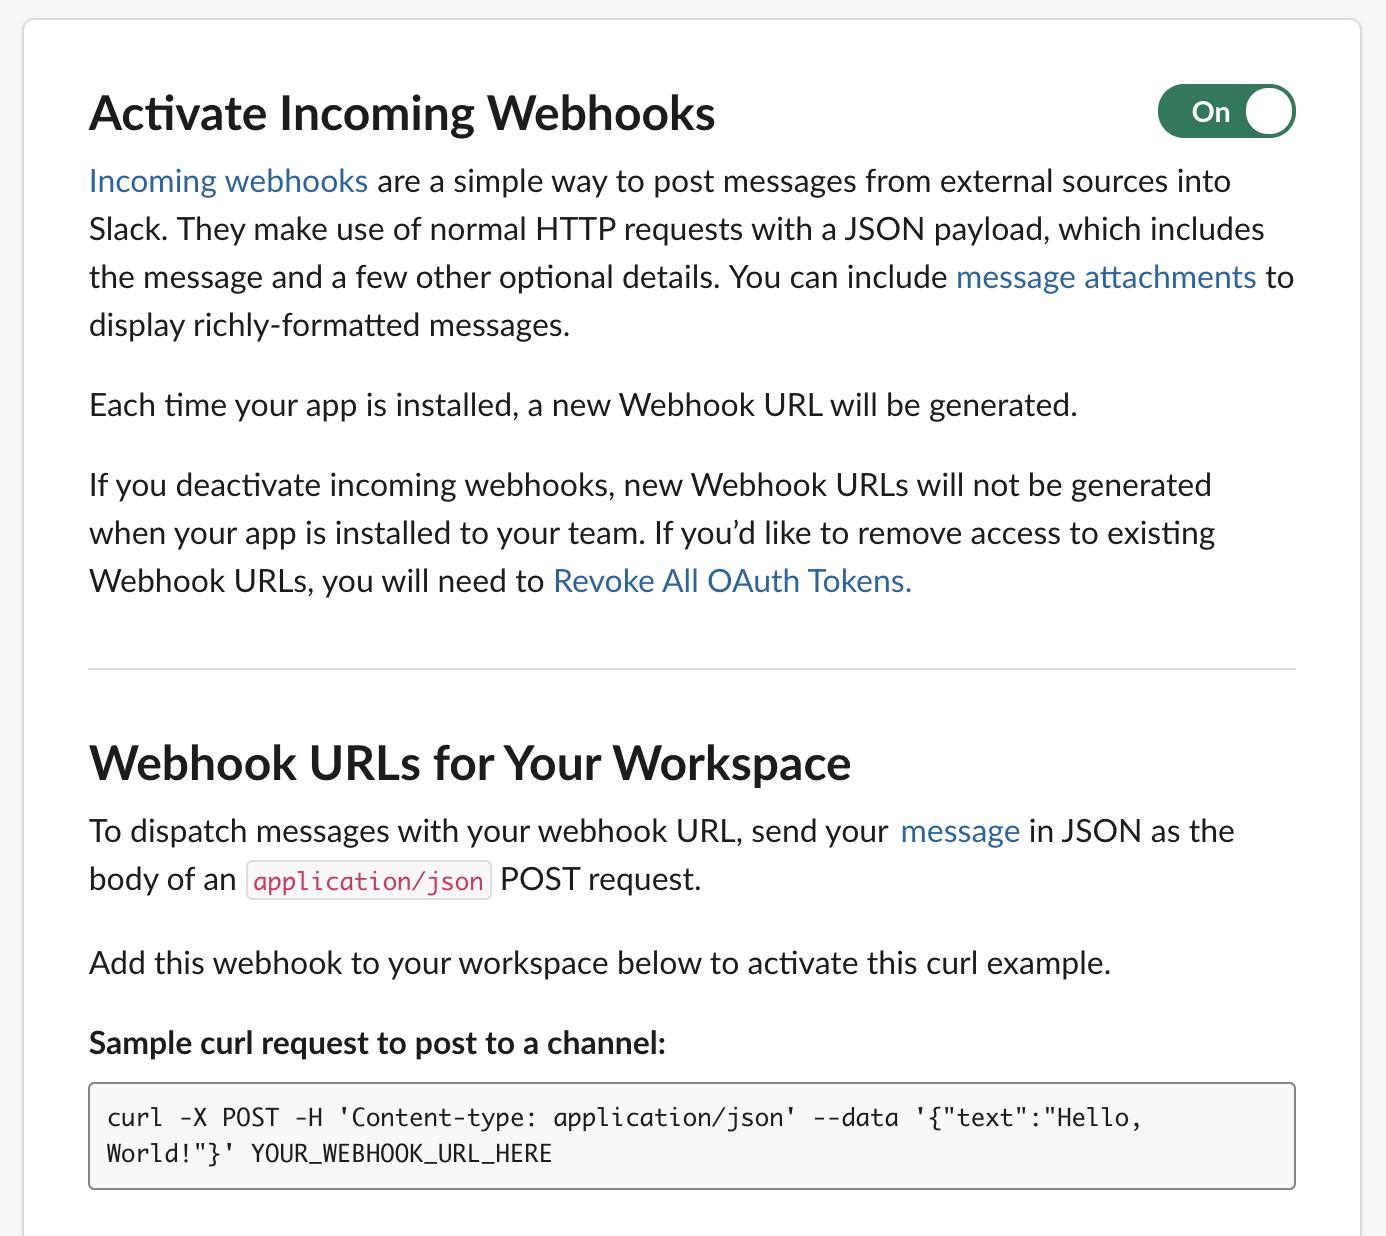 Slack app - Activate Incoming Webhooks